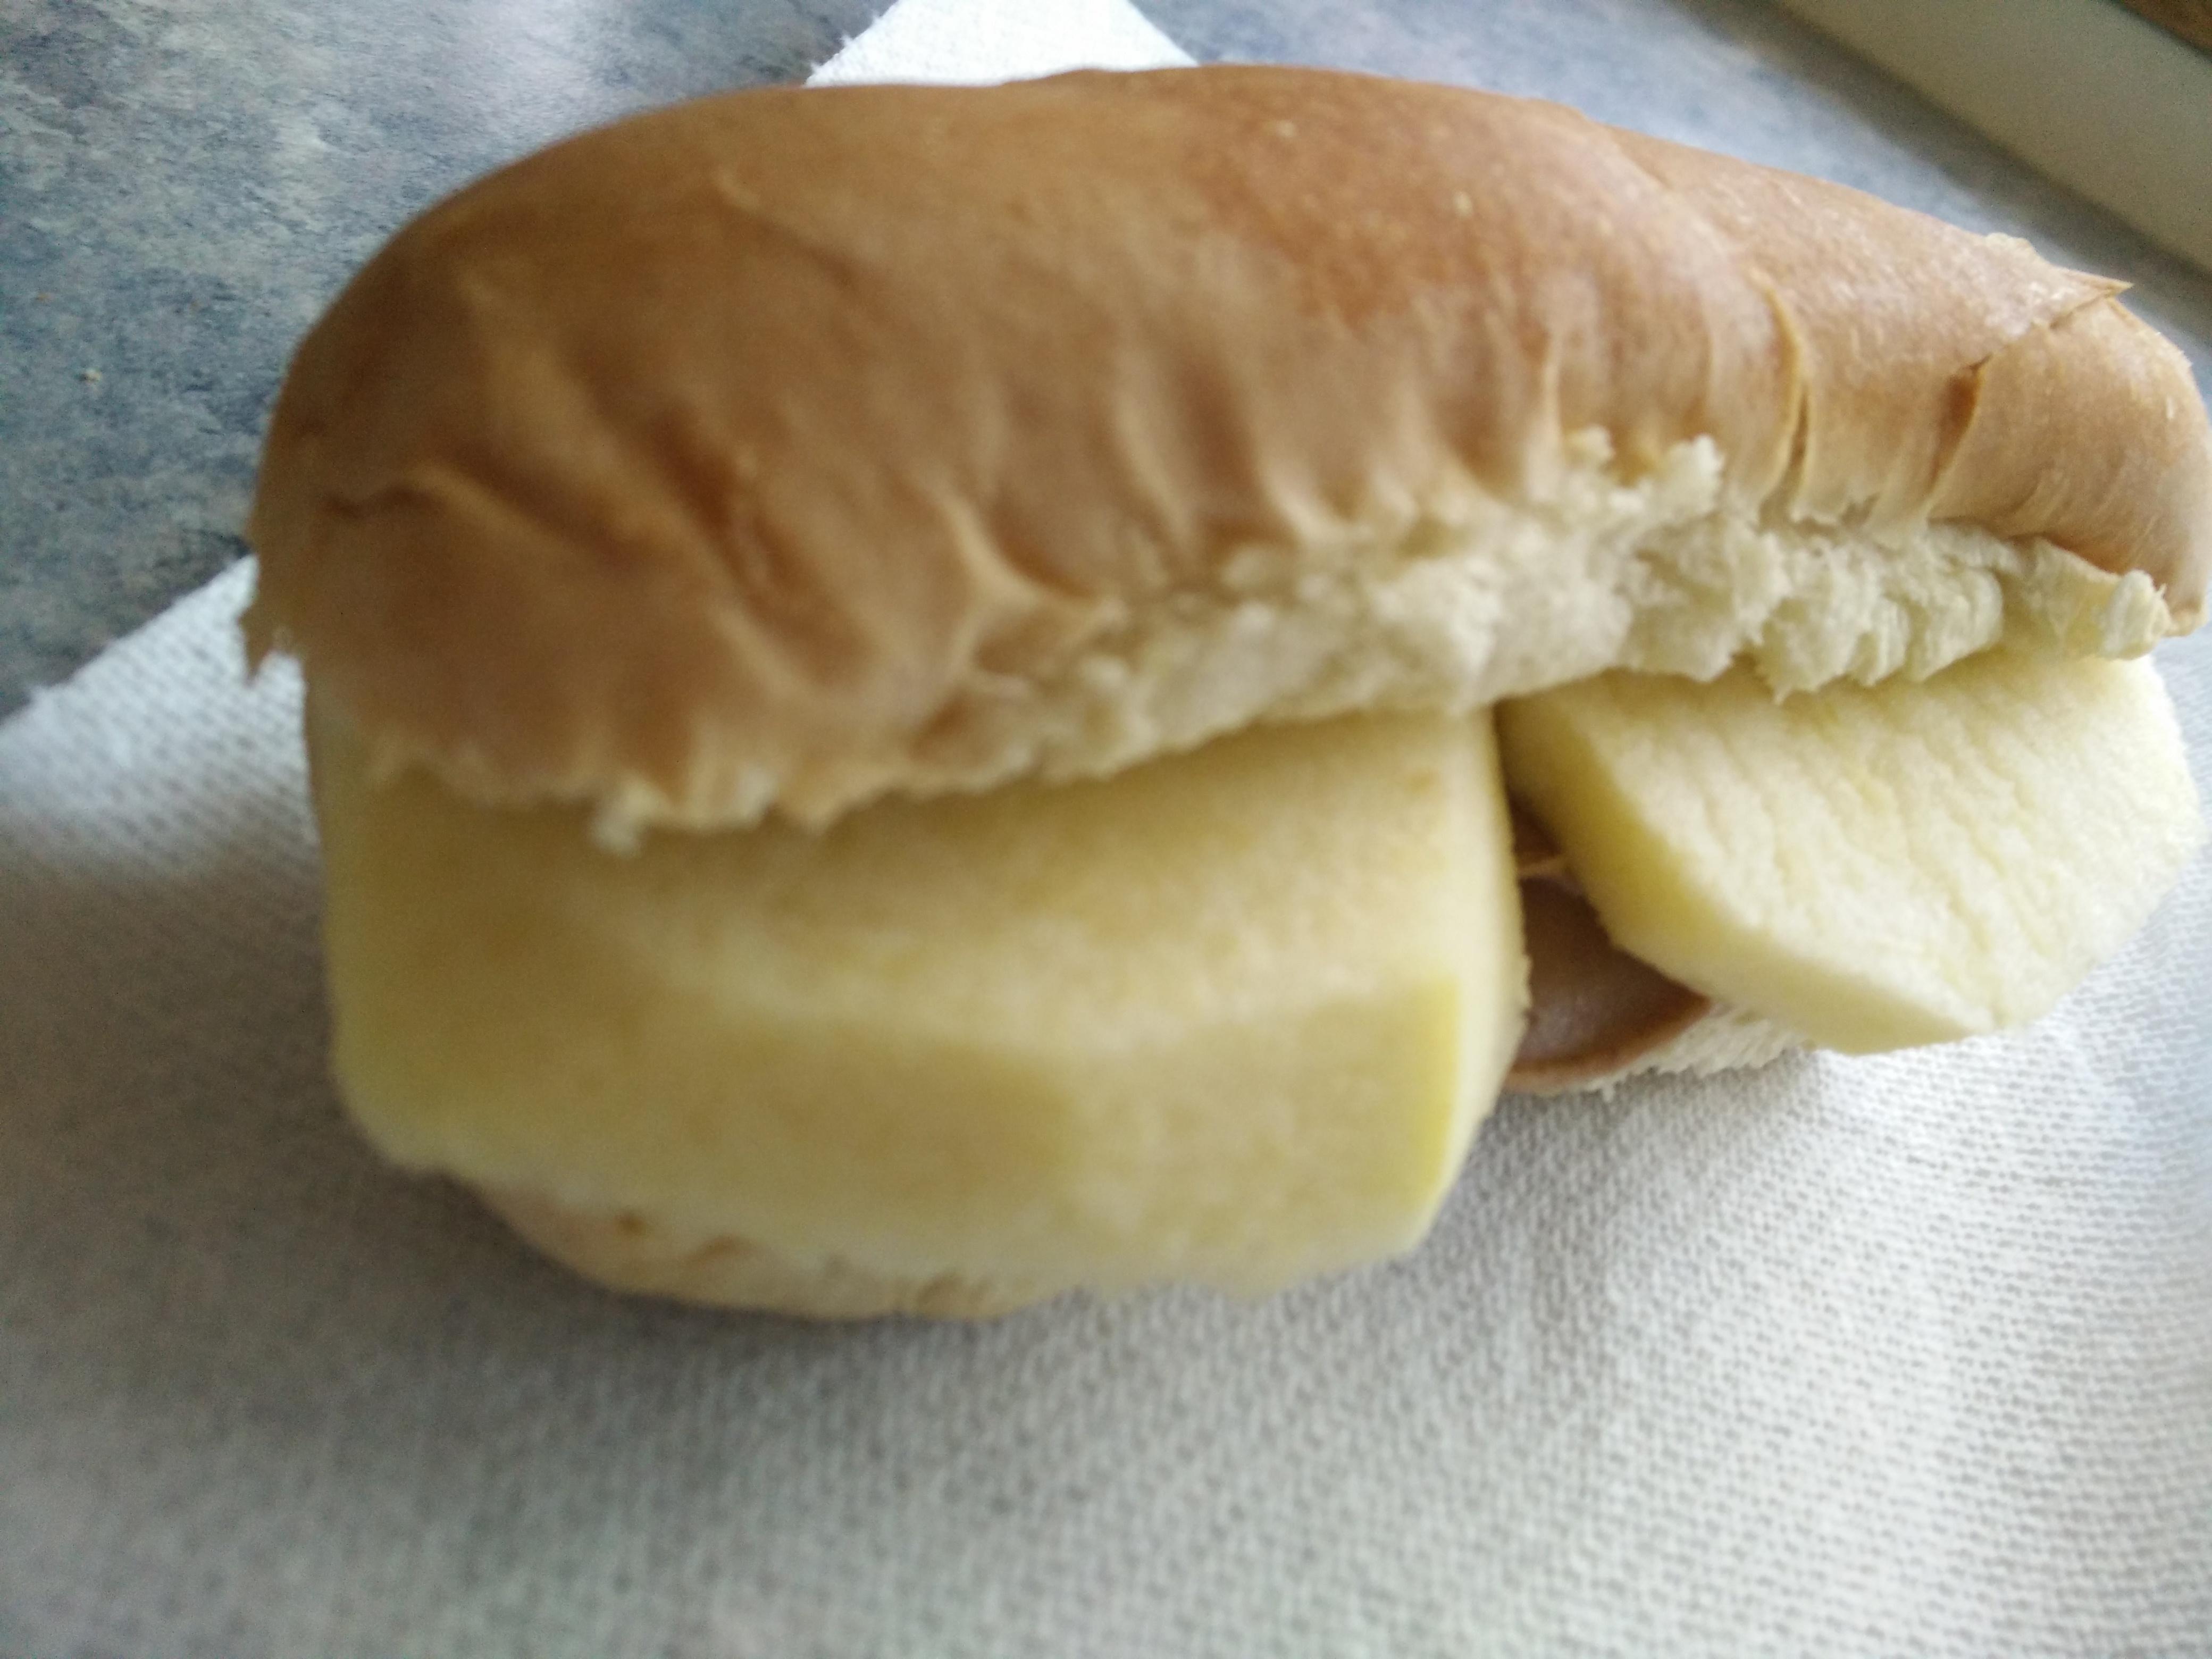 ambrosia peanut butter dog